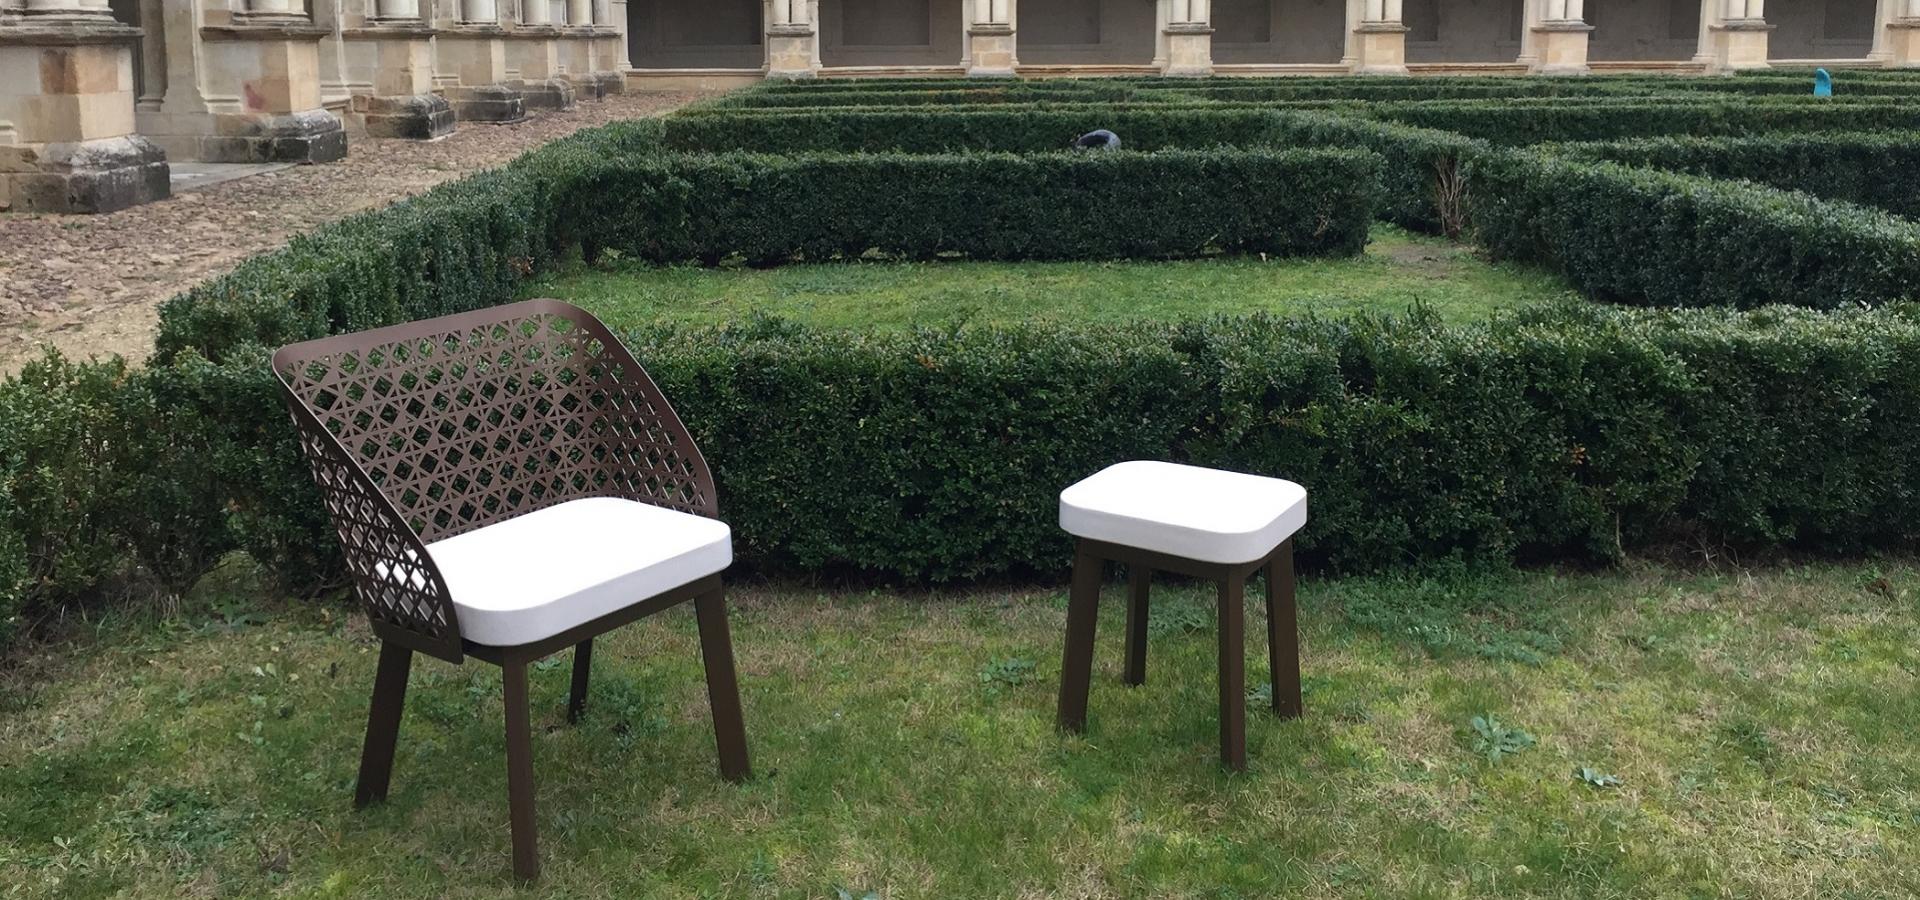 ABBAYE DE FONTEVRAUD Chaise acier ceramique mobilconcpets metalco